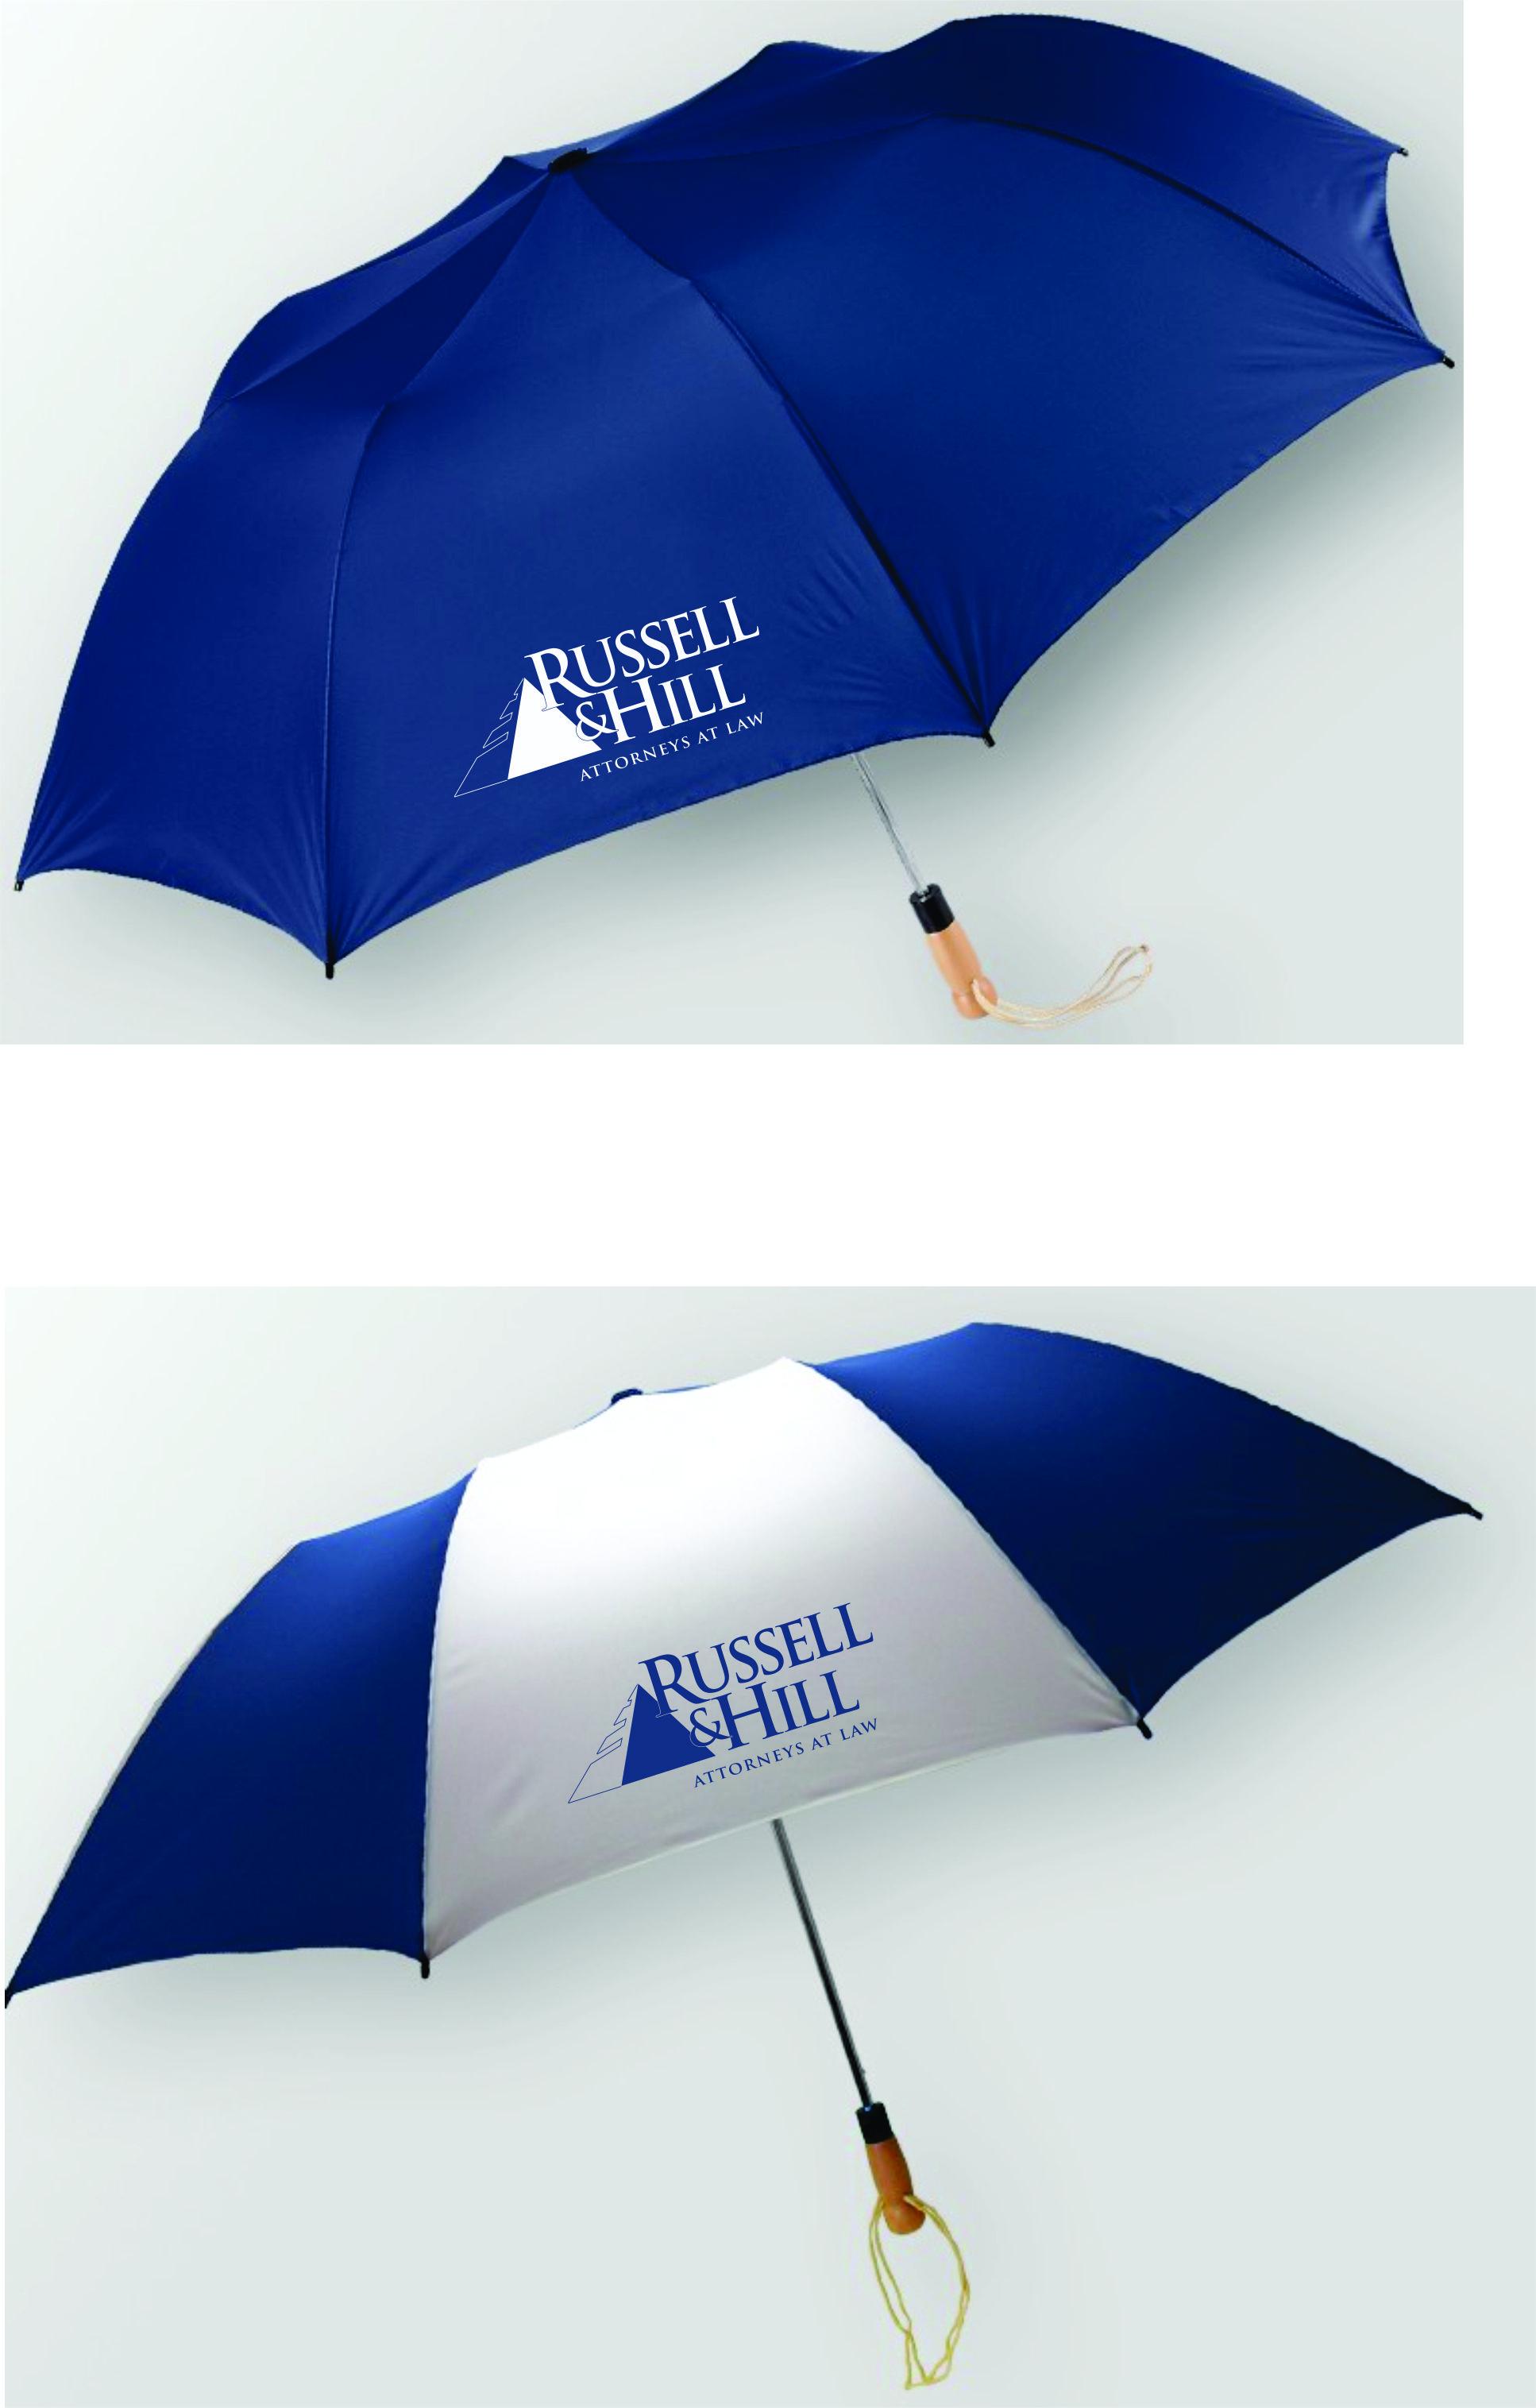 inventory closeout sale u2013 get free logo printed umbrellas now